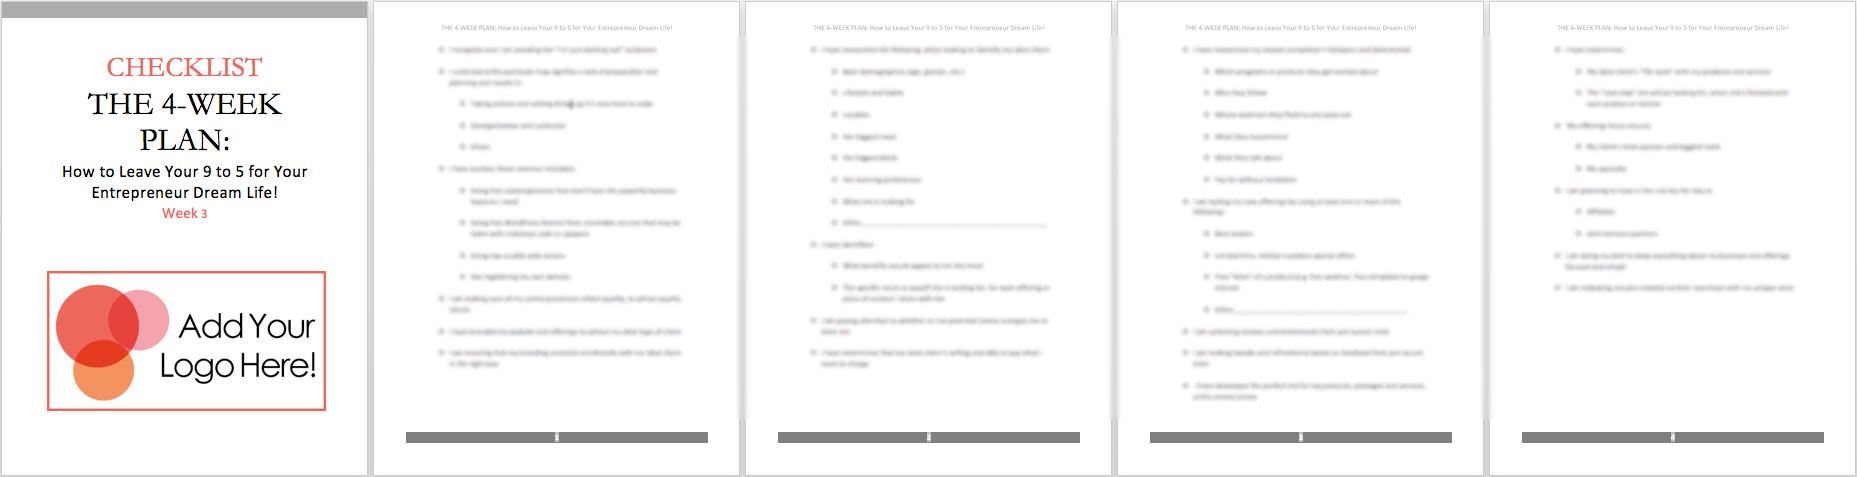 3-checklist